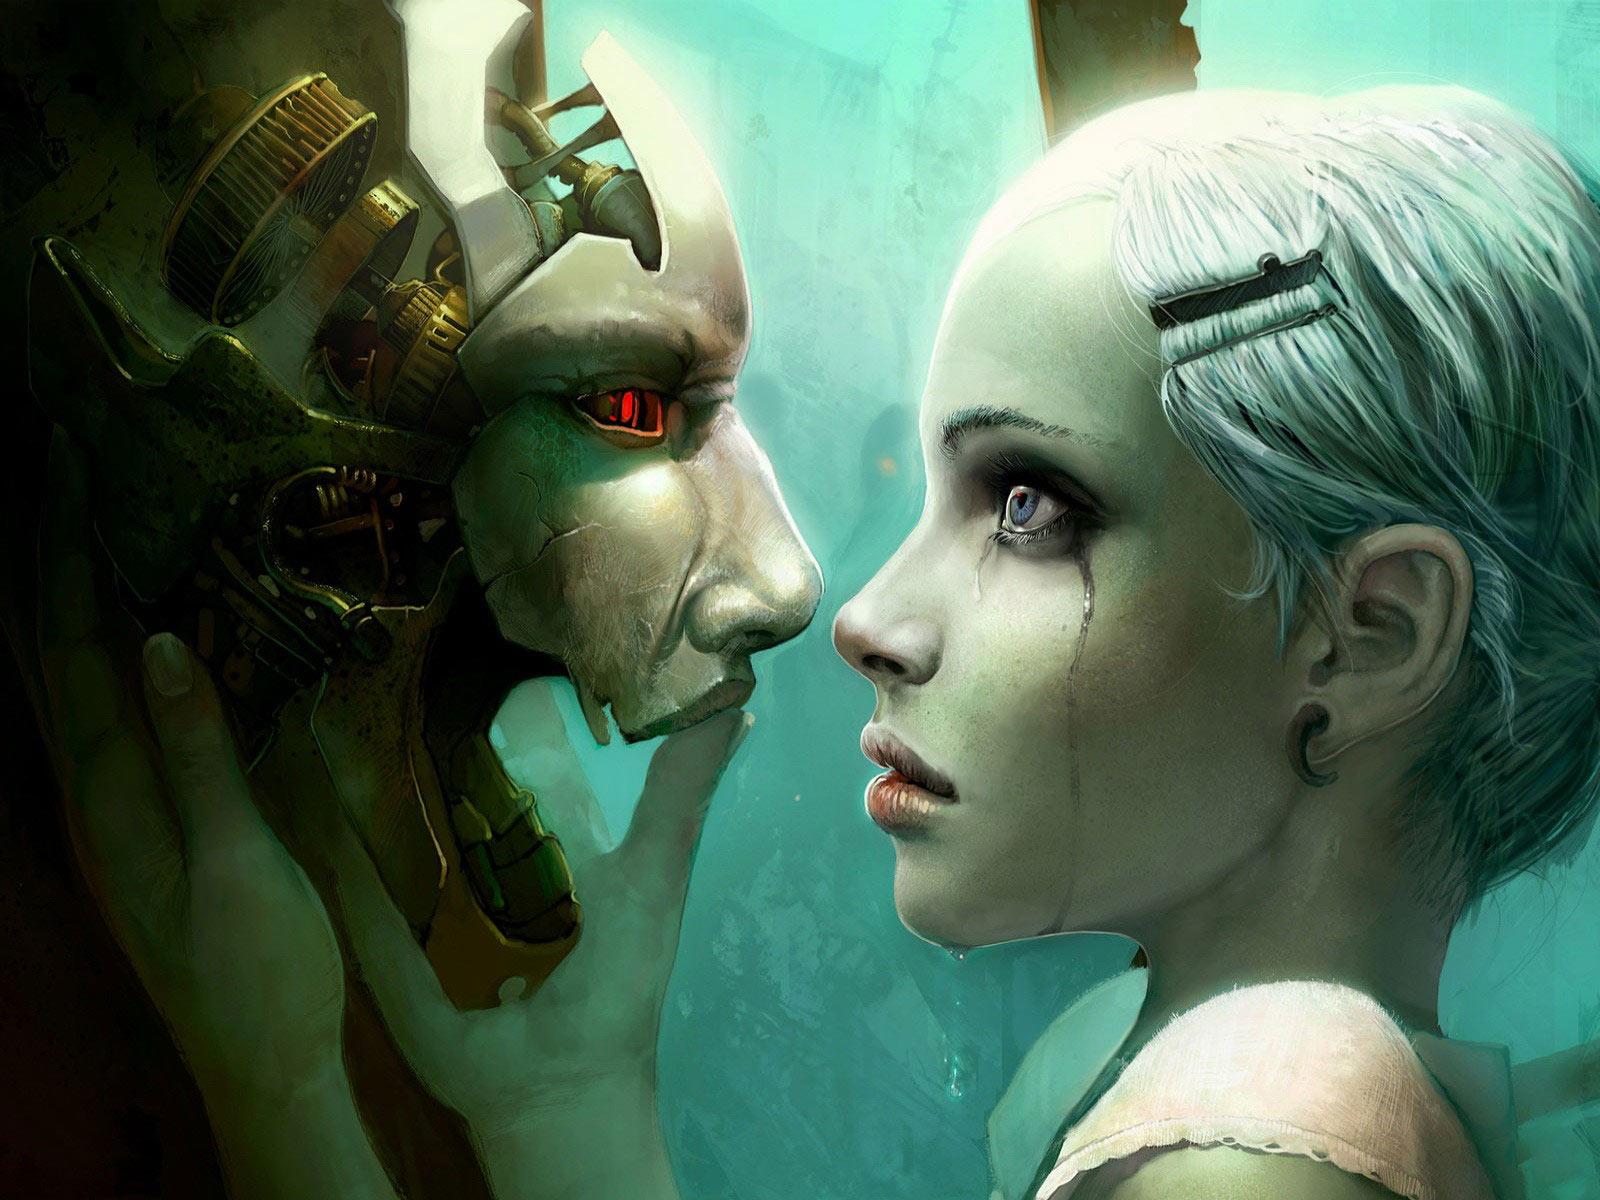 http://3.bp.blogspot.com/-nyqqFpoLbW8/To3tsK6vacI/AAAAAAAAAG4/9ZUIjOo2q5c/s1600/fantasy-wallpaper-desktop-3.jpg